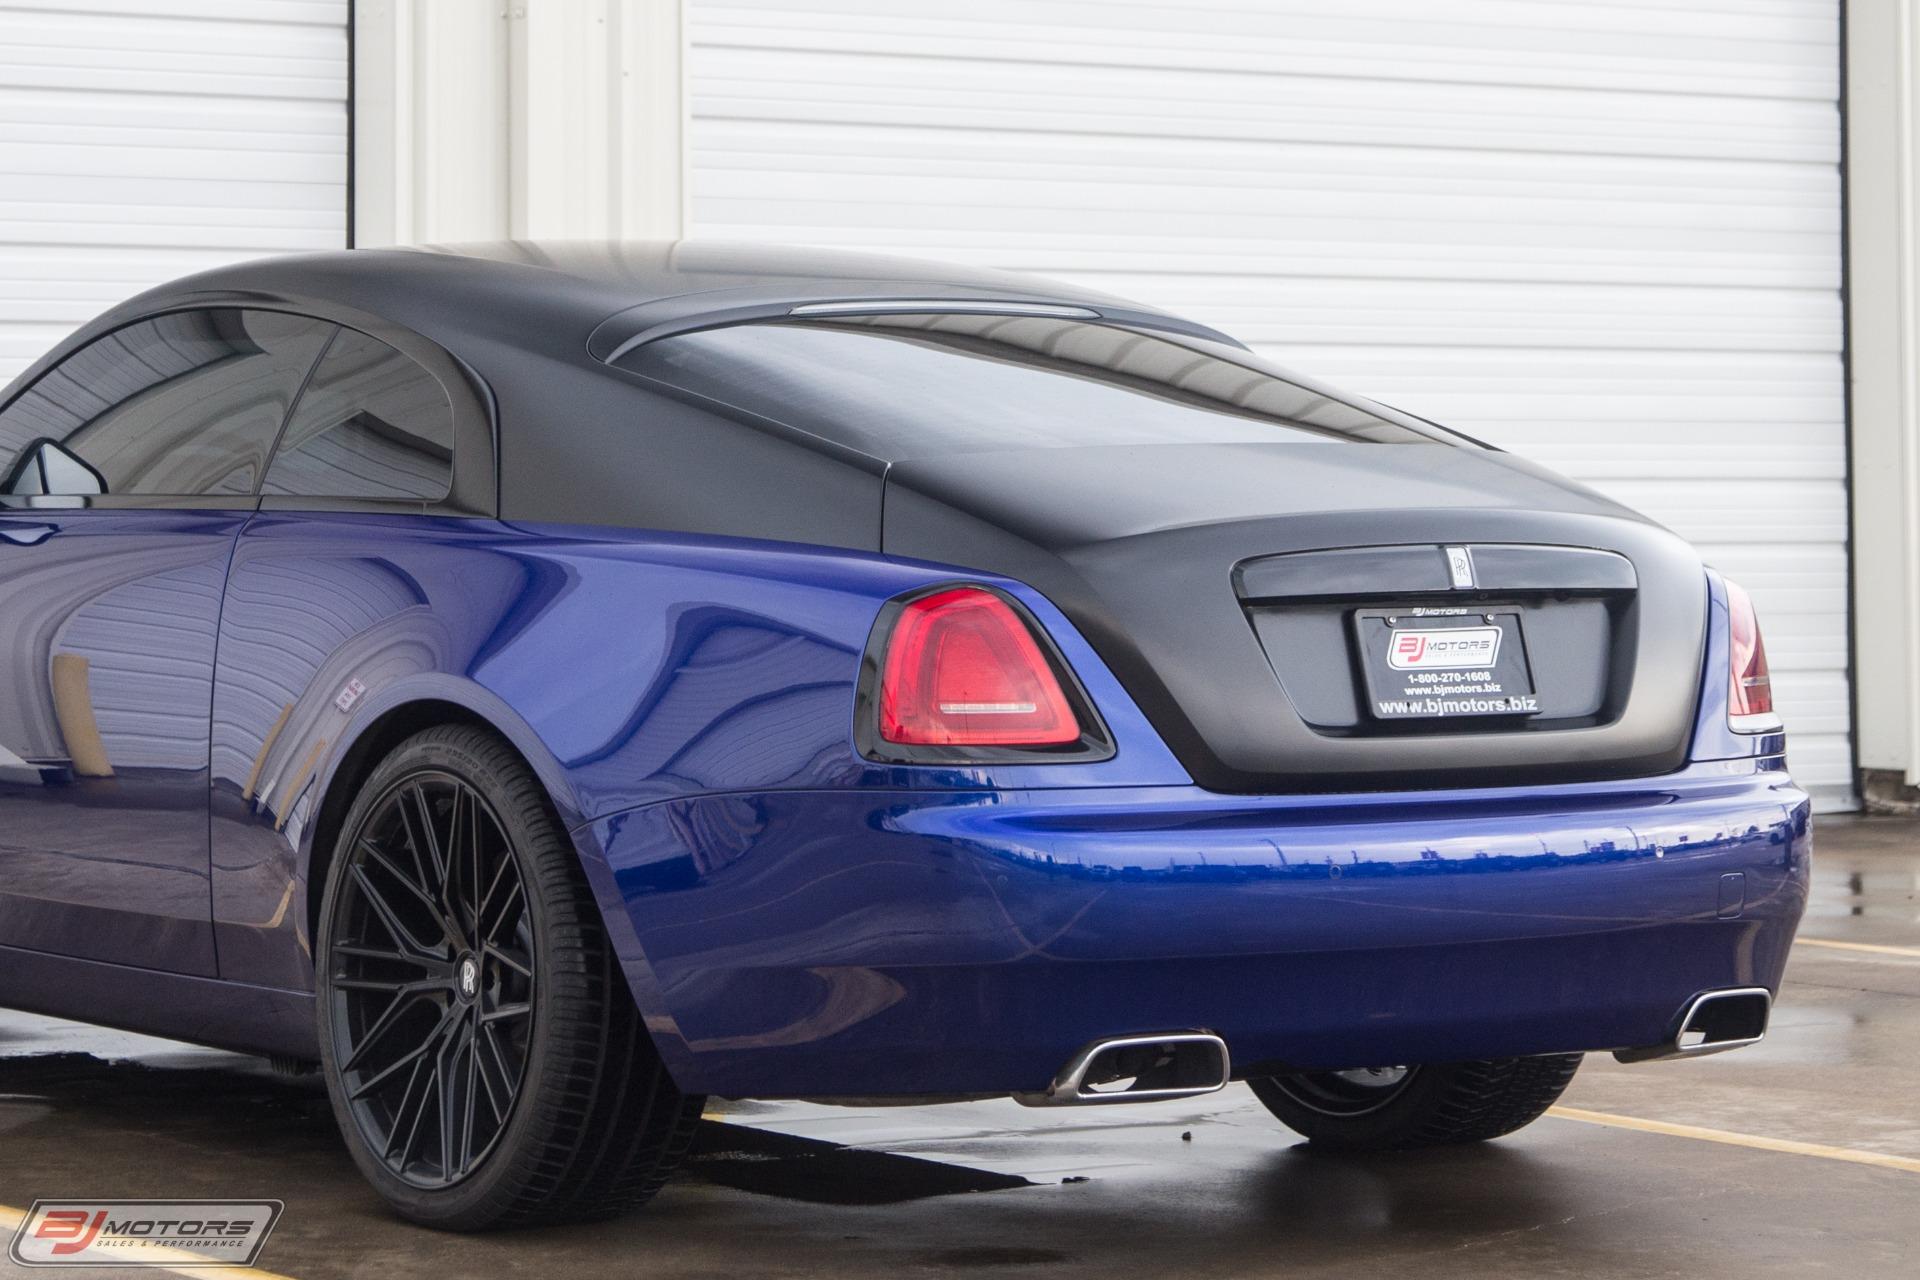 Used-2016-Rolls-Royce-Wraith-Starlight-Headliner